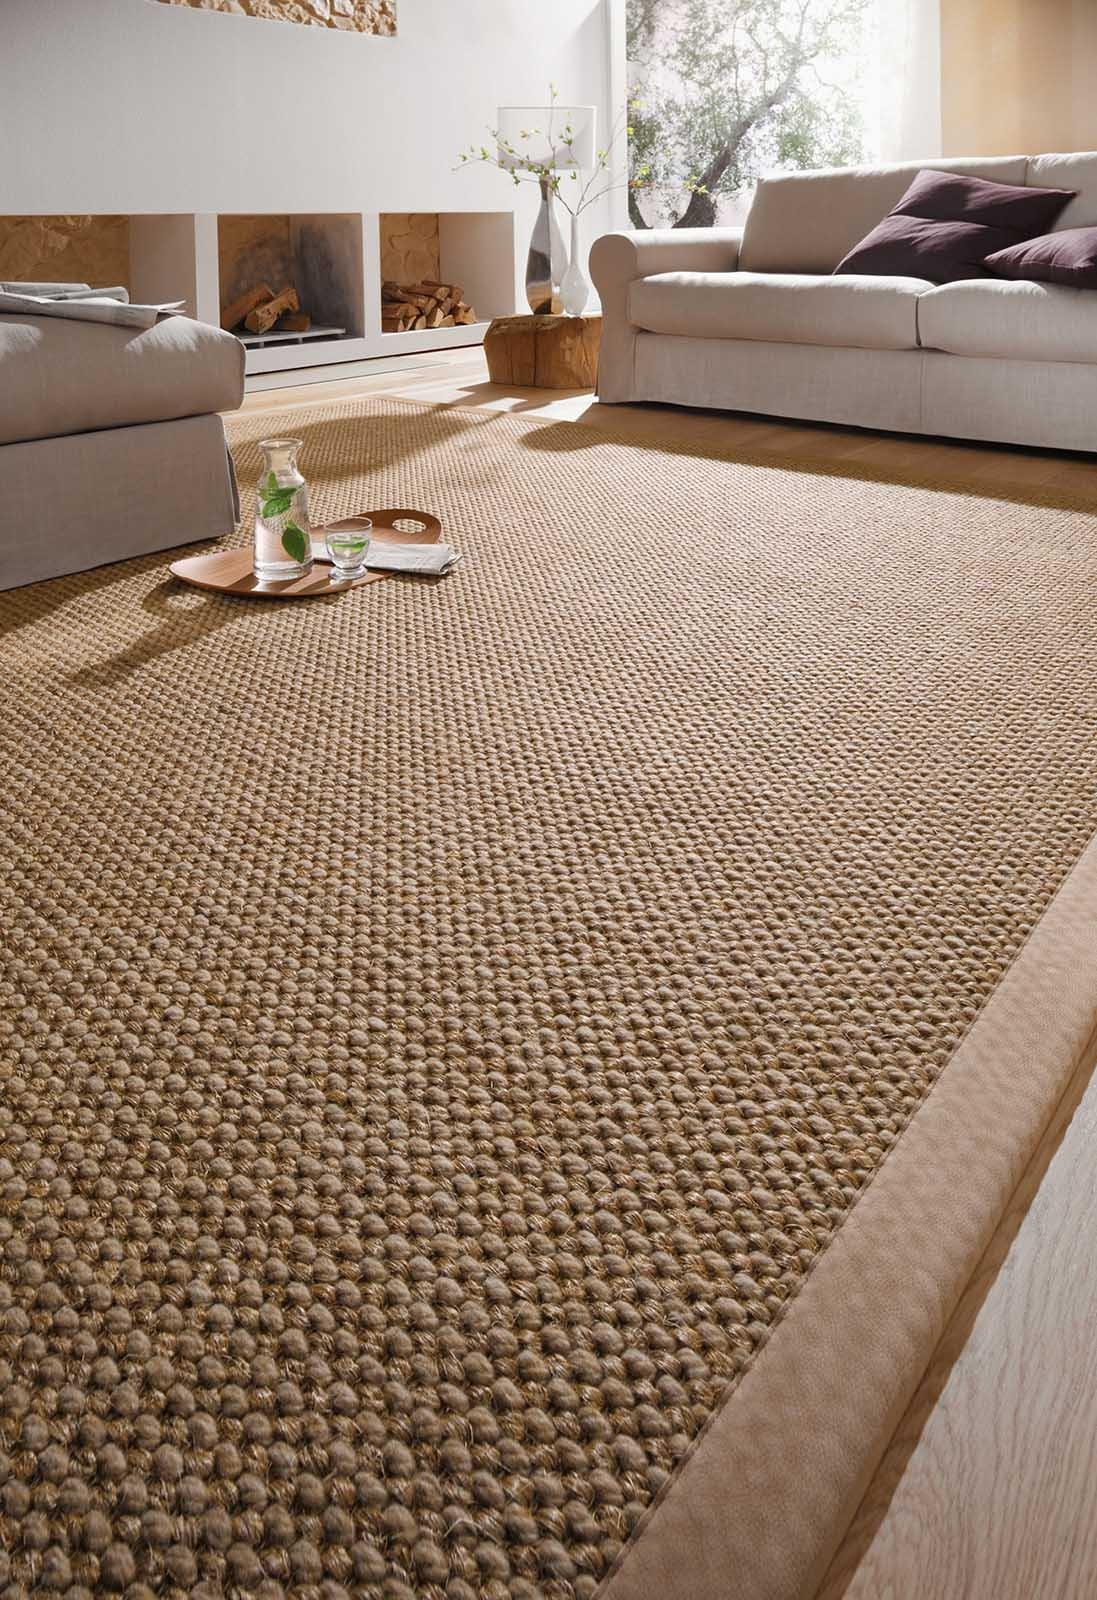 Costo tappeti naturali